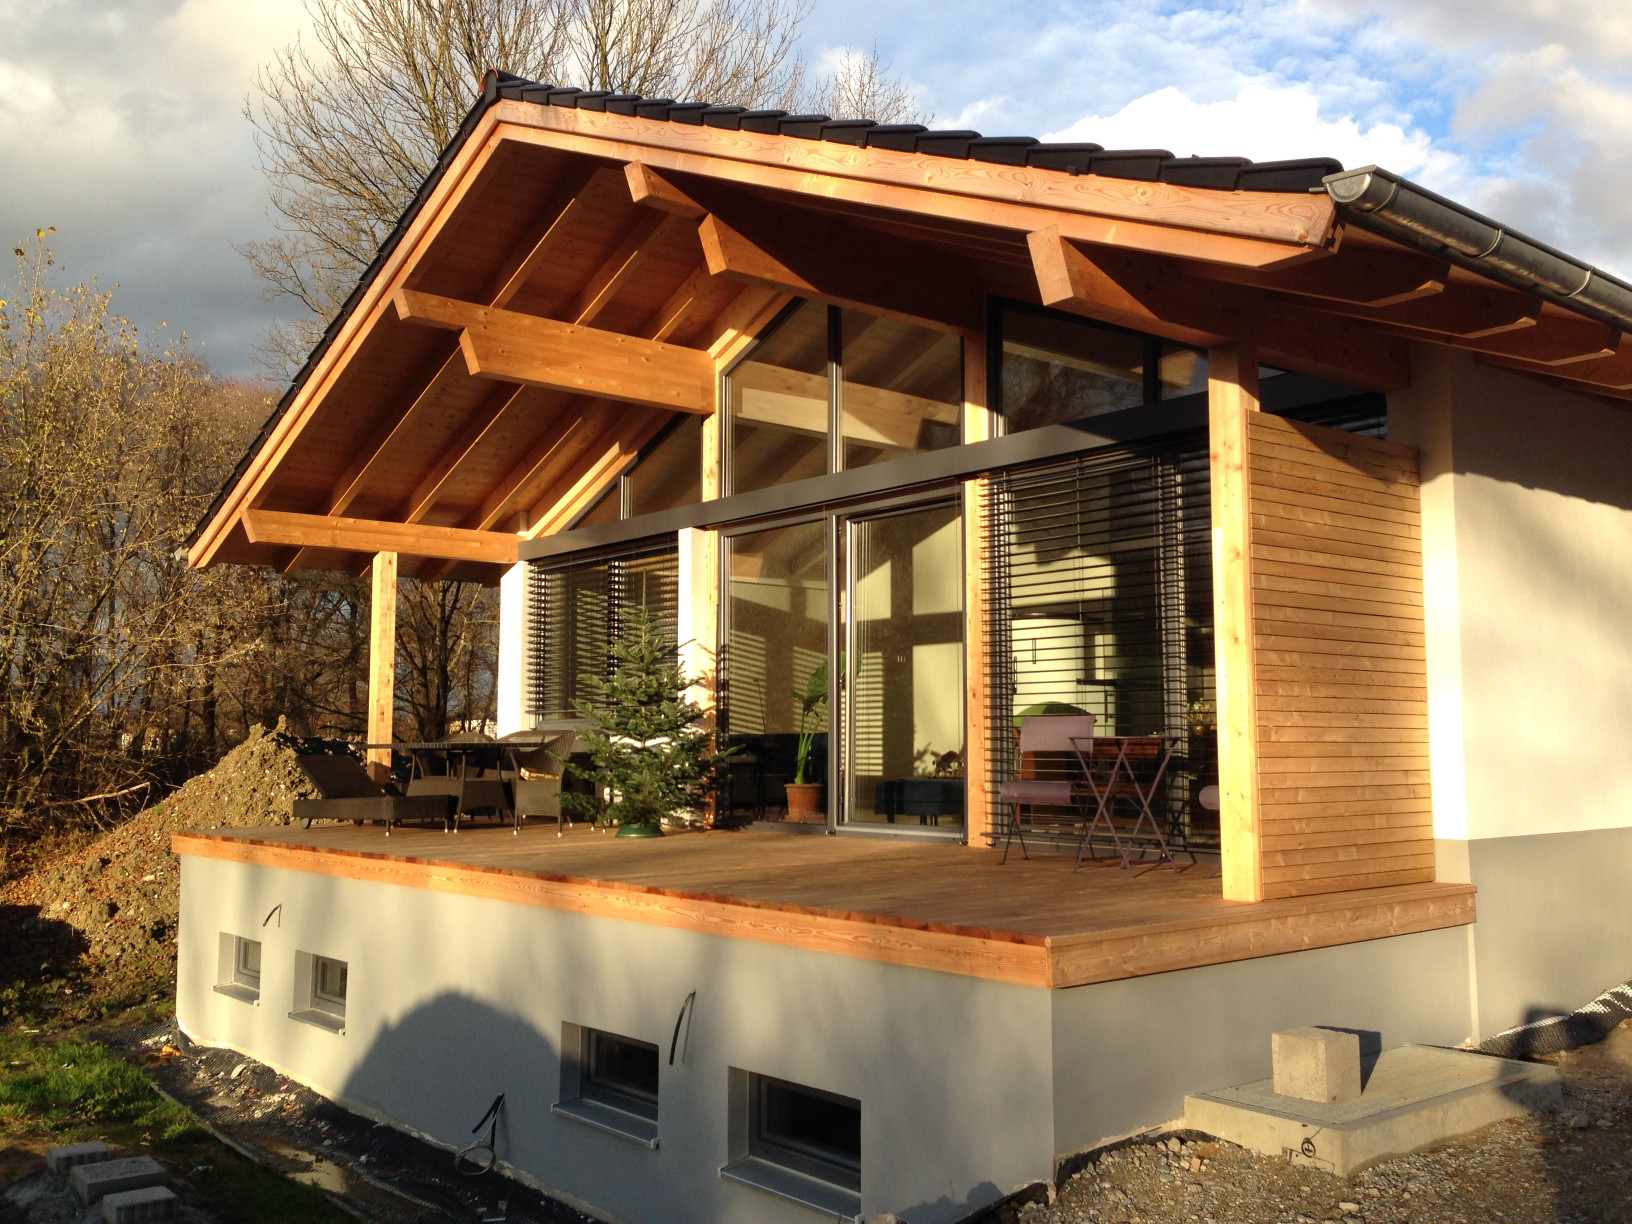 IMG_3738Strasser Holzbau Riedering.jpg